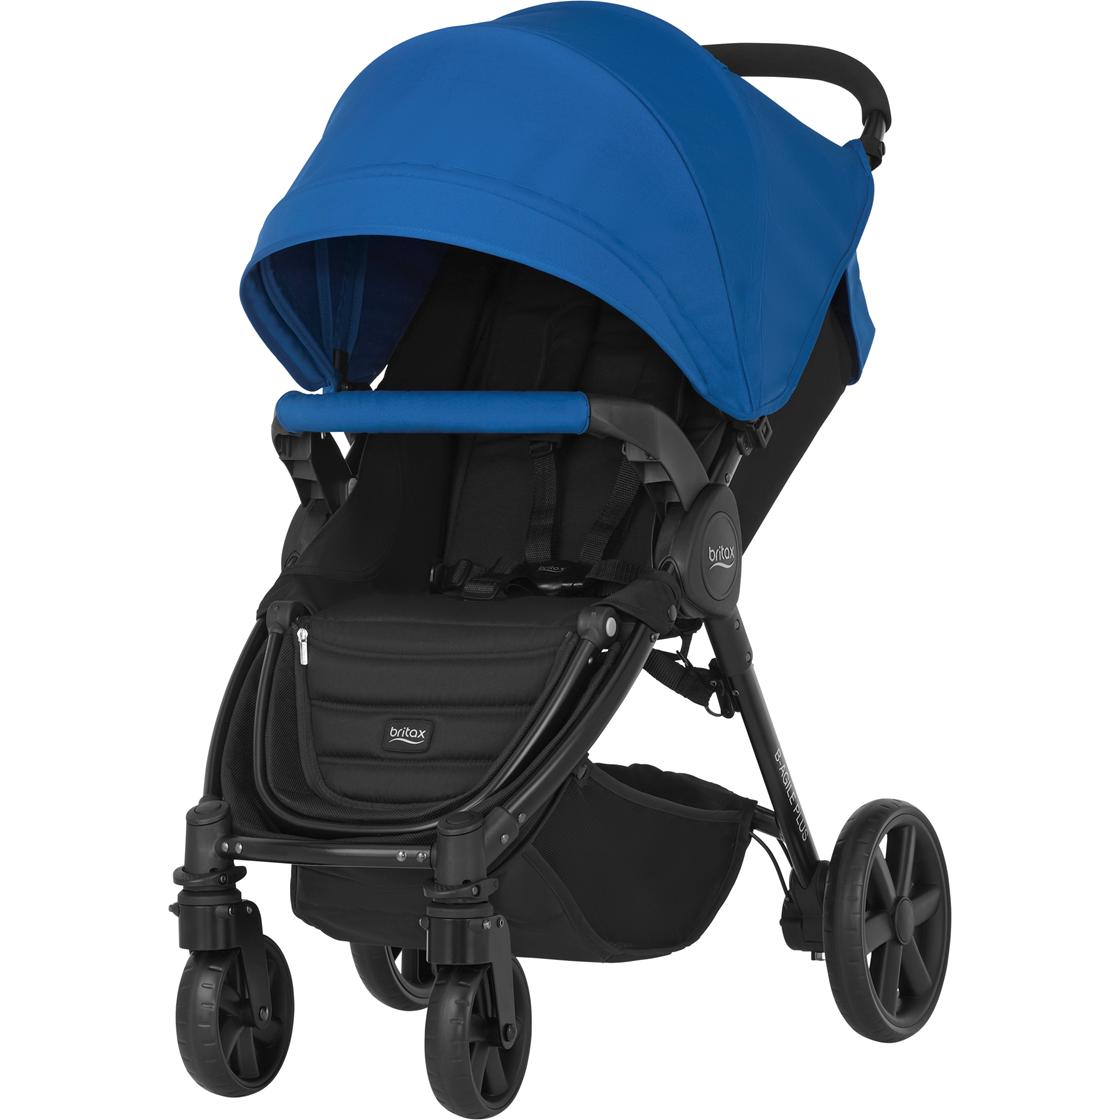 Carro bebé Britax B-Agile 4 Plus Baby Stroller